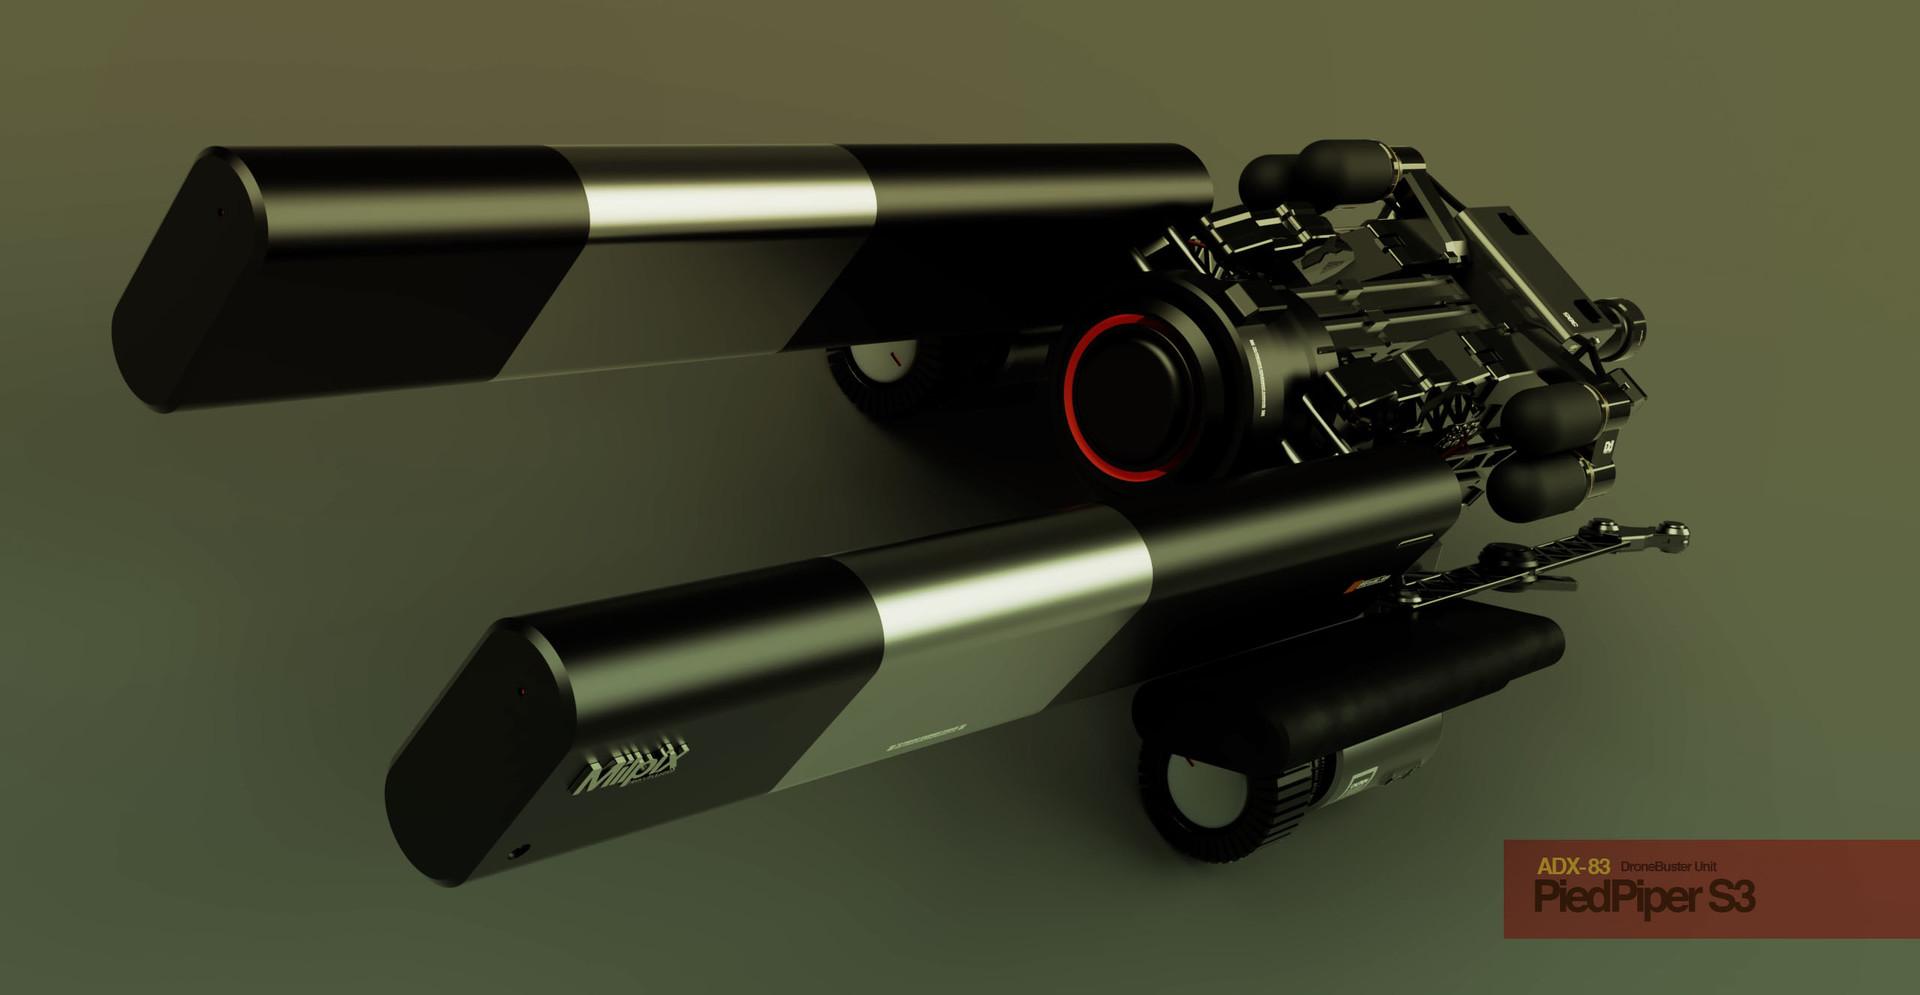 Milpix b555